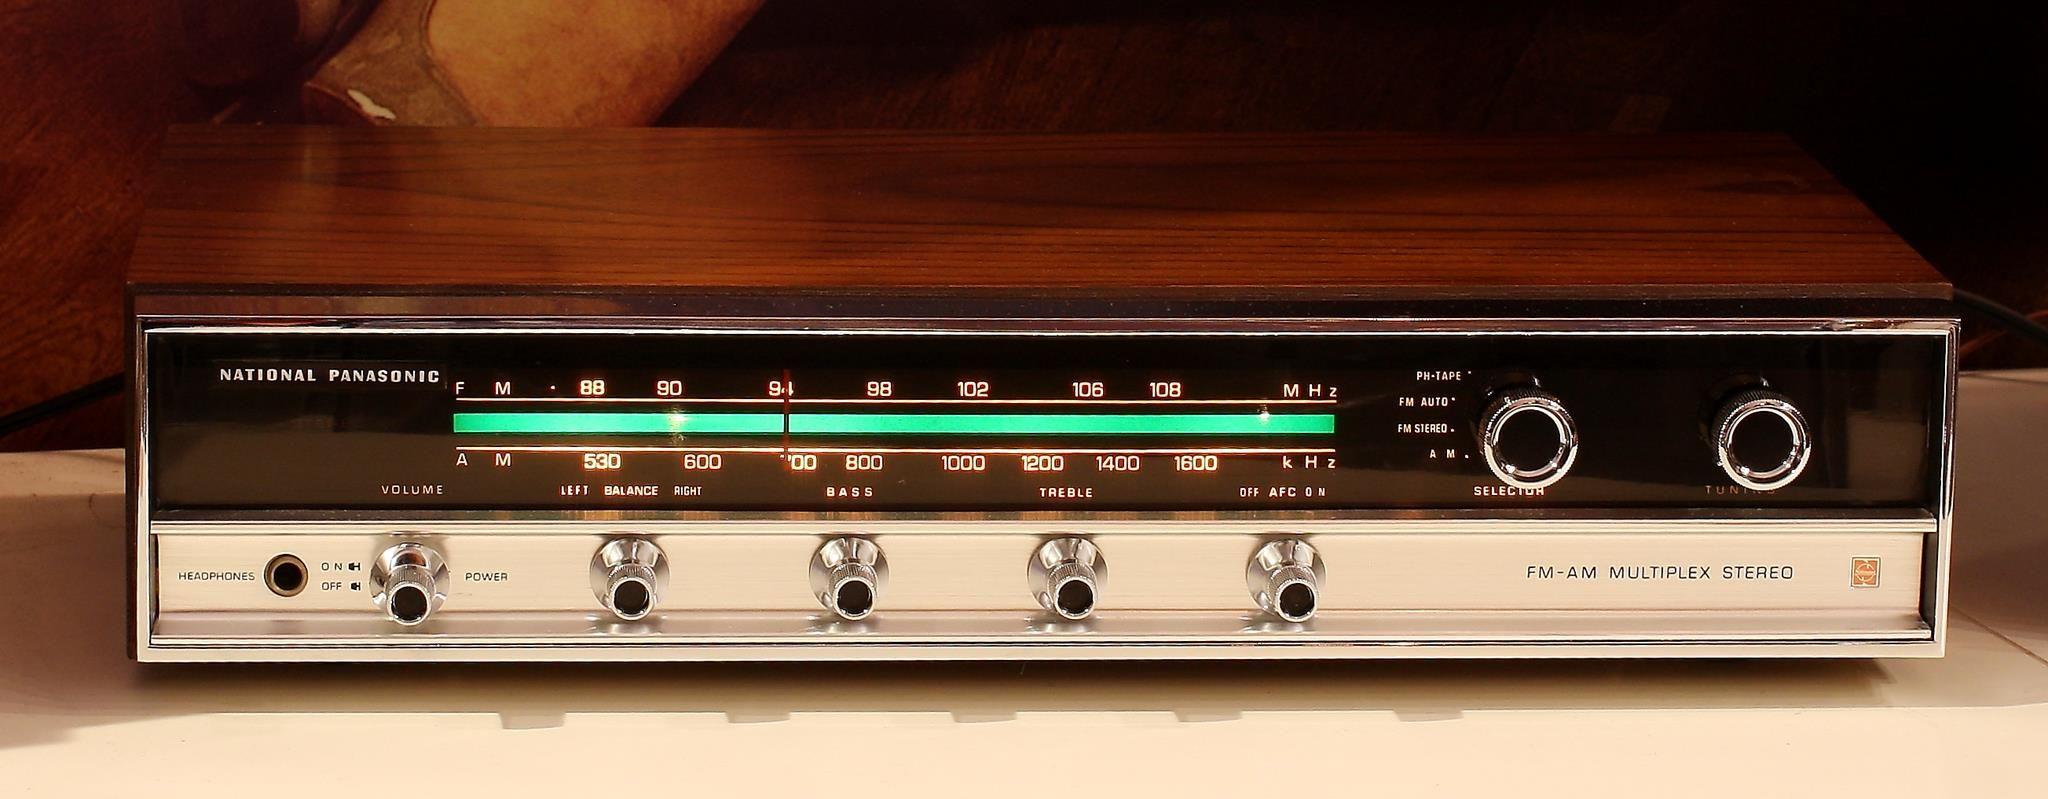 National Panasonic Re 7670b Vintage Technics Stereo Set Vintage Audio Shop 3 Maja 19 Katowice Poland Www Vintageaudio Pl Mobile 4872211 Audio Hifi Audio Hifi